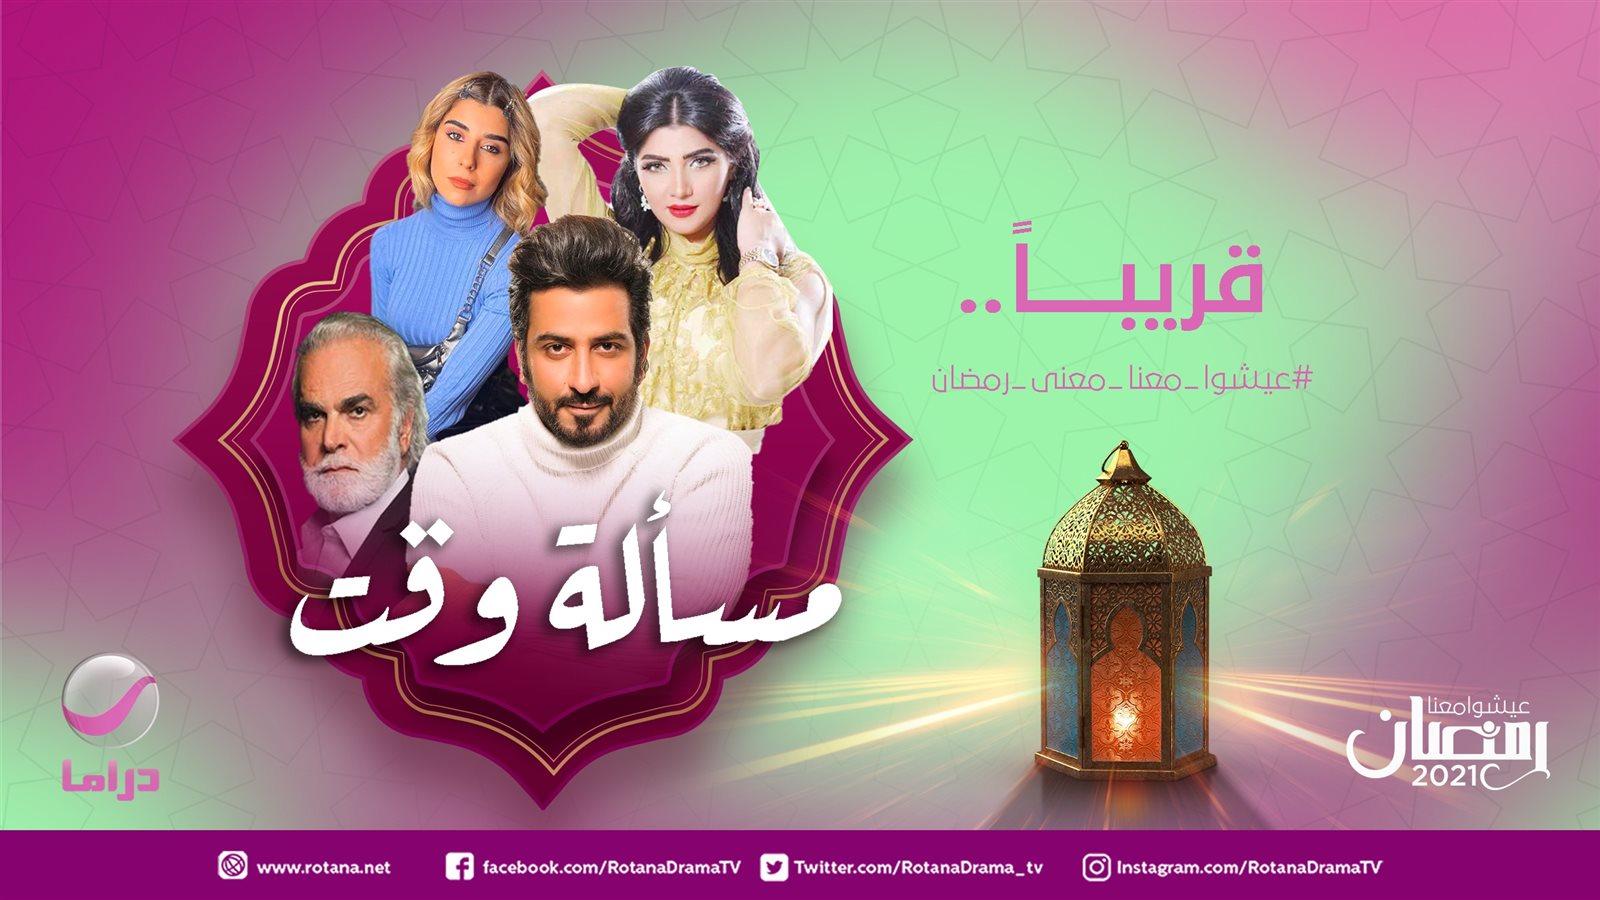 d29a942a 8b39 472d beb5 cefc49351d84 - قائمة مسلسلات رمضان 2021 على قناة روتانا دراما كاملة